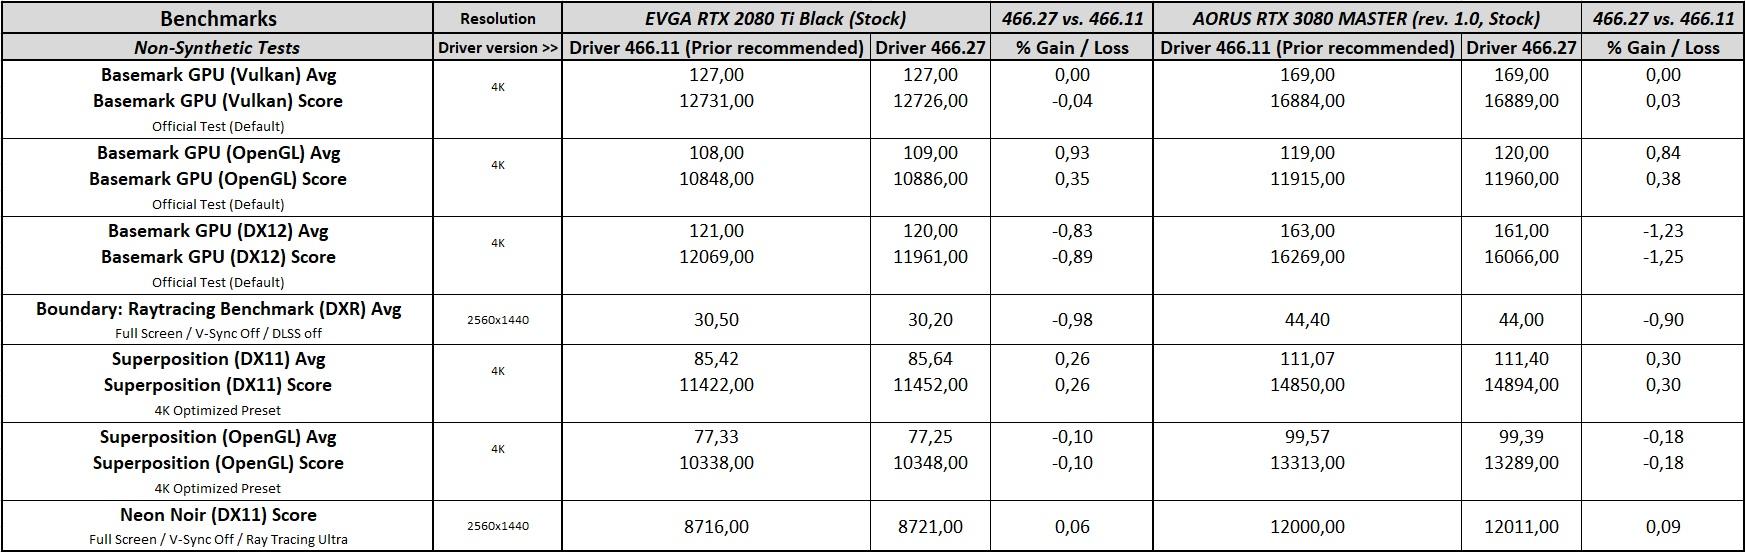 geforce 466.27 driver performance